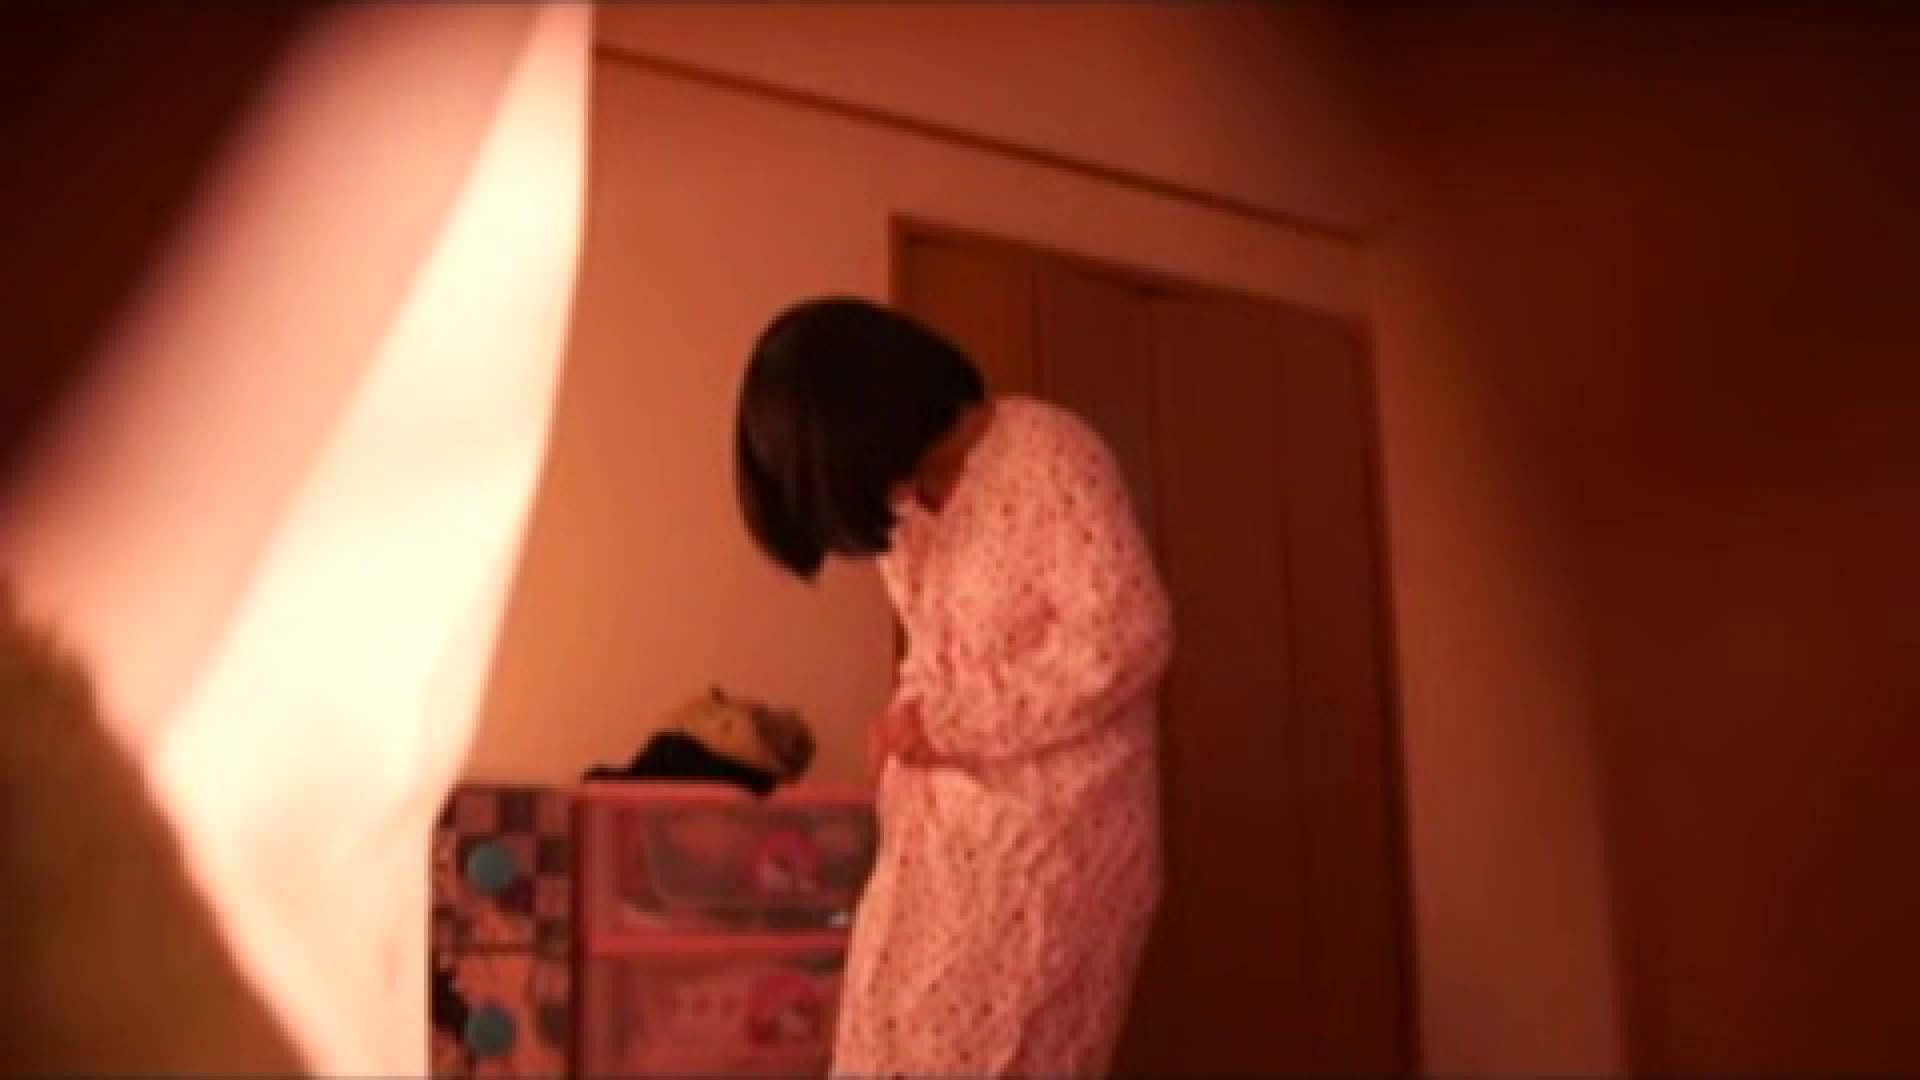 vol.2 まりこさんのお着替え、就寝前の映像です。 エッチすぎるOL達 | 着替えシーン  29連発 5